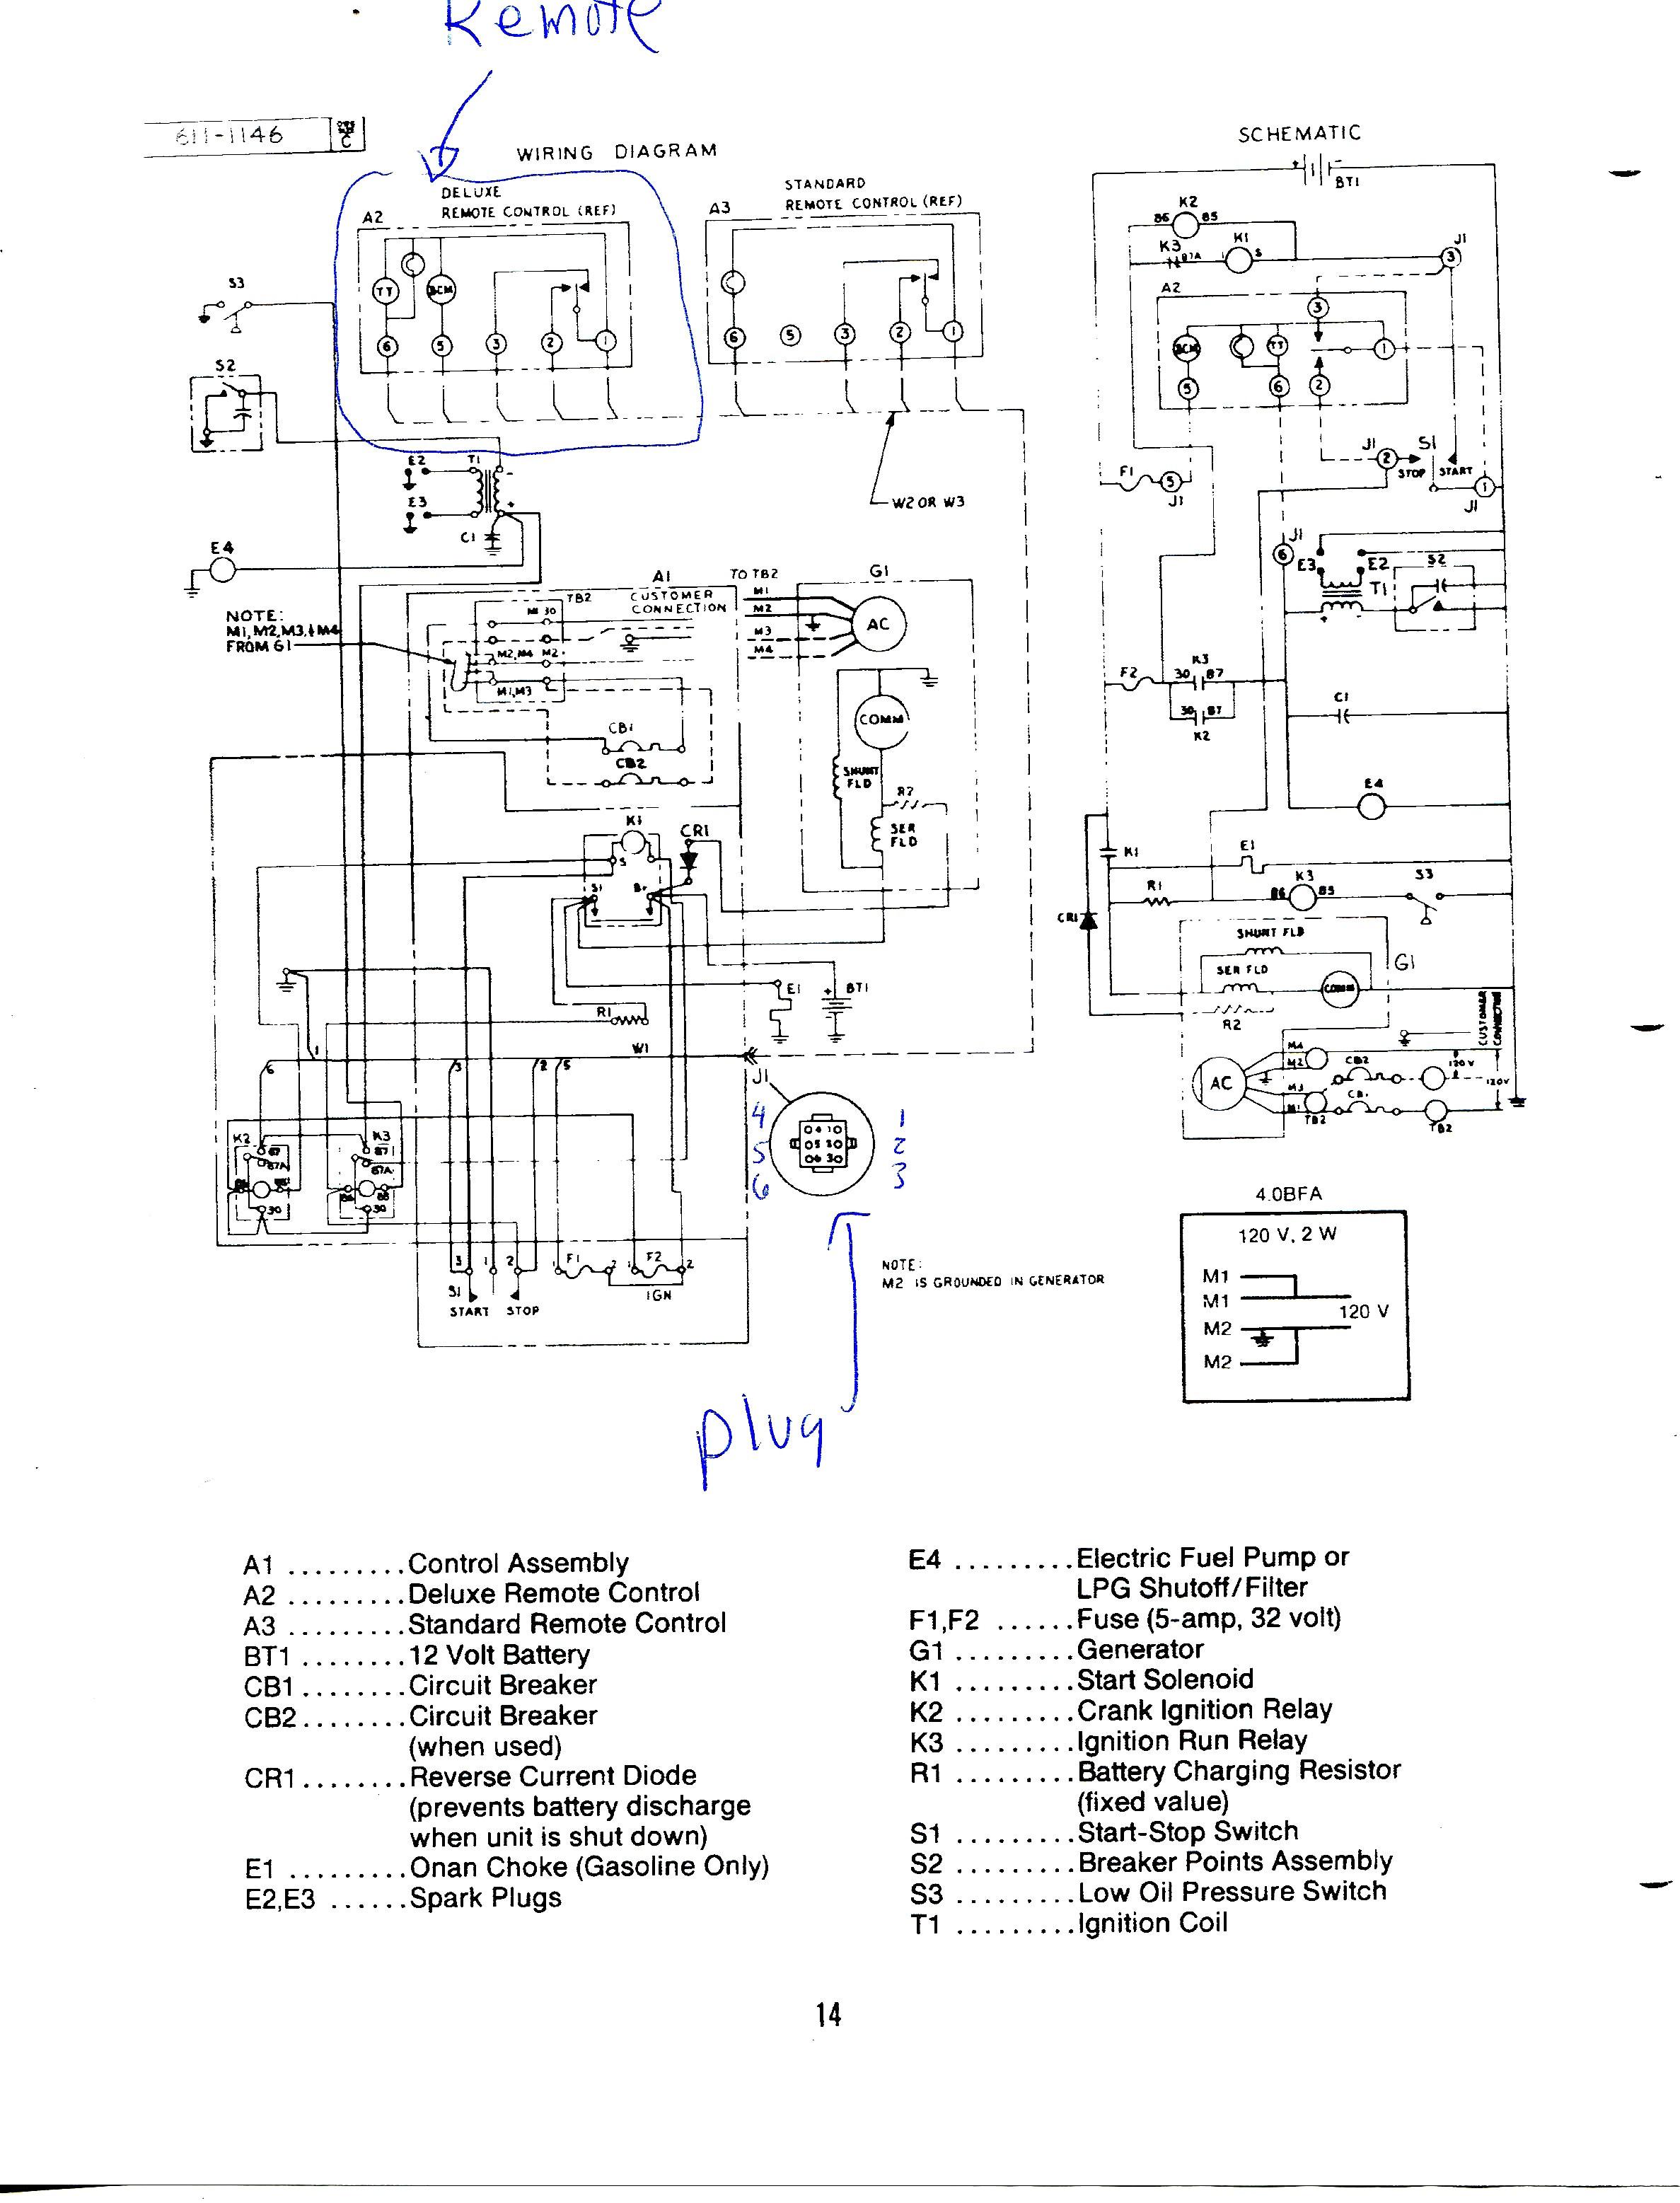 Generator Backfeed Wiring Diagram Free Downloads Nice 87 Generator - Generator Backfeed Wiring Diagram